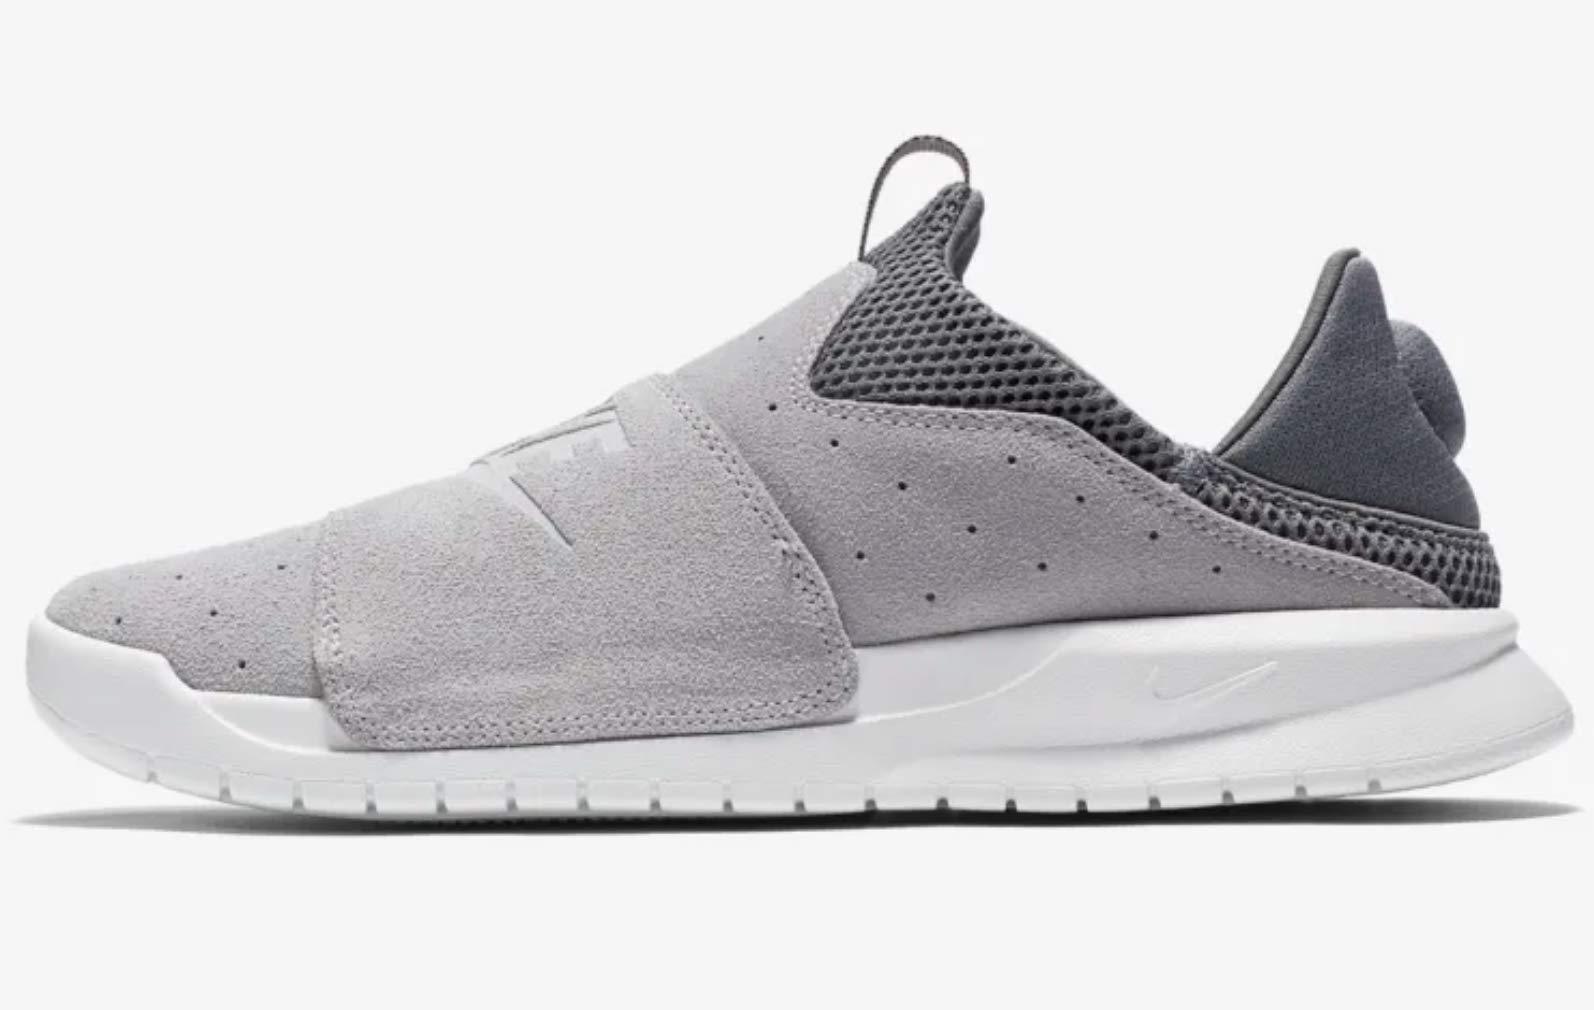 best sneakers 3fc70 08771 Galleon - Nike Benassi SLP Mens Style   882410 Mens 882410-002 Size 9.5